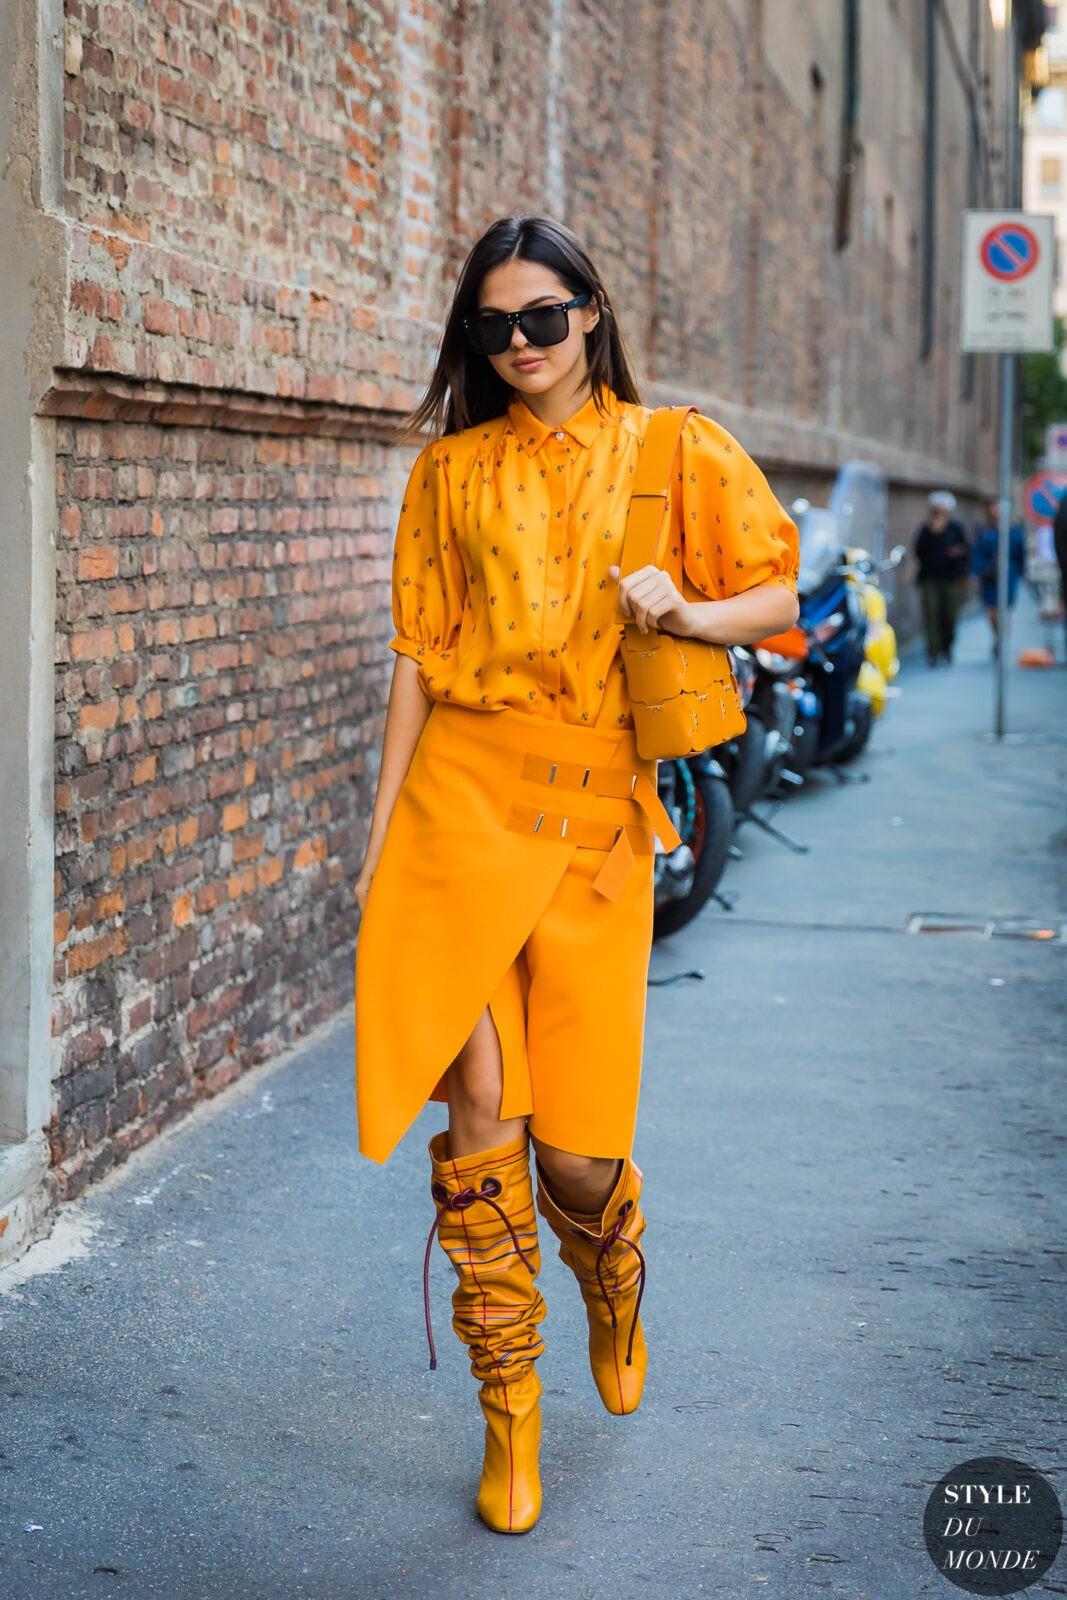 head to toe yellow stylebook edit seven toronto 2018